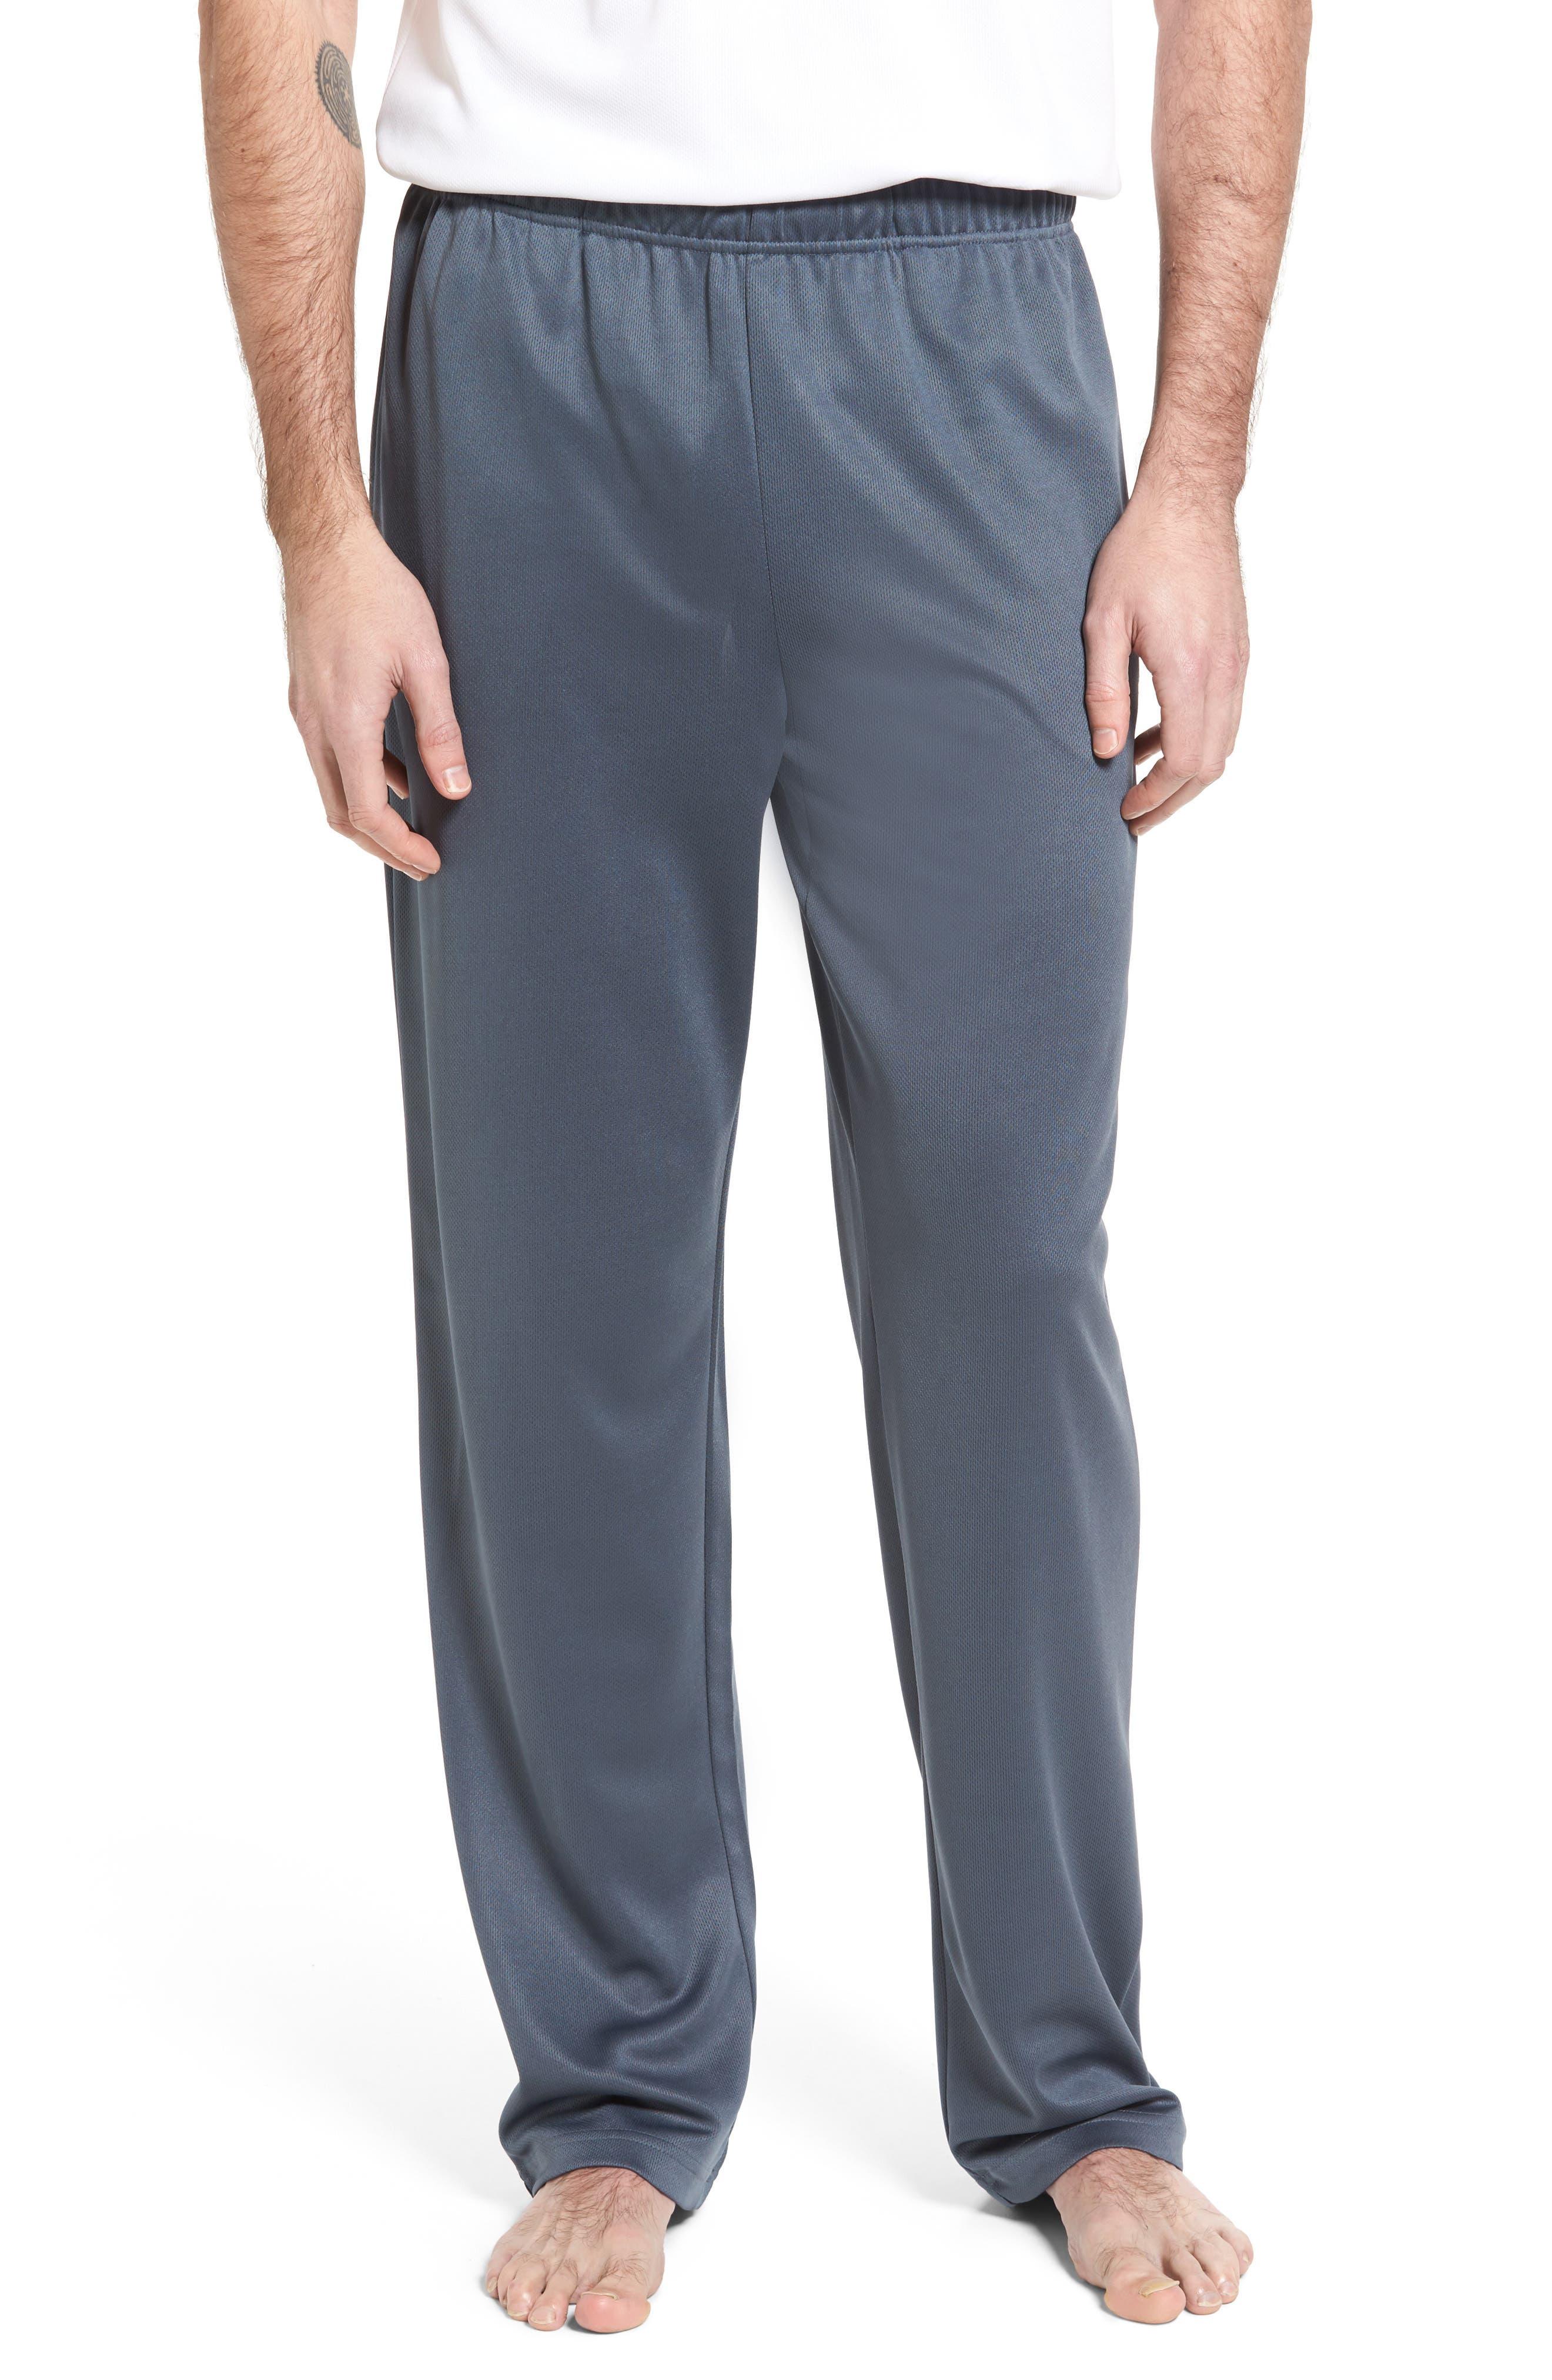 Work Out Lounge Pants,                             Main thumbnail 2, color,